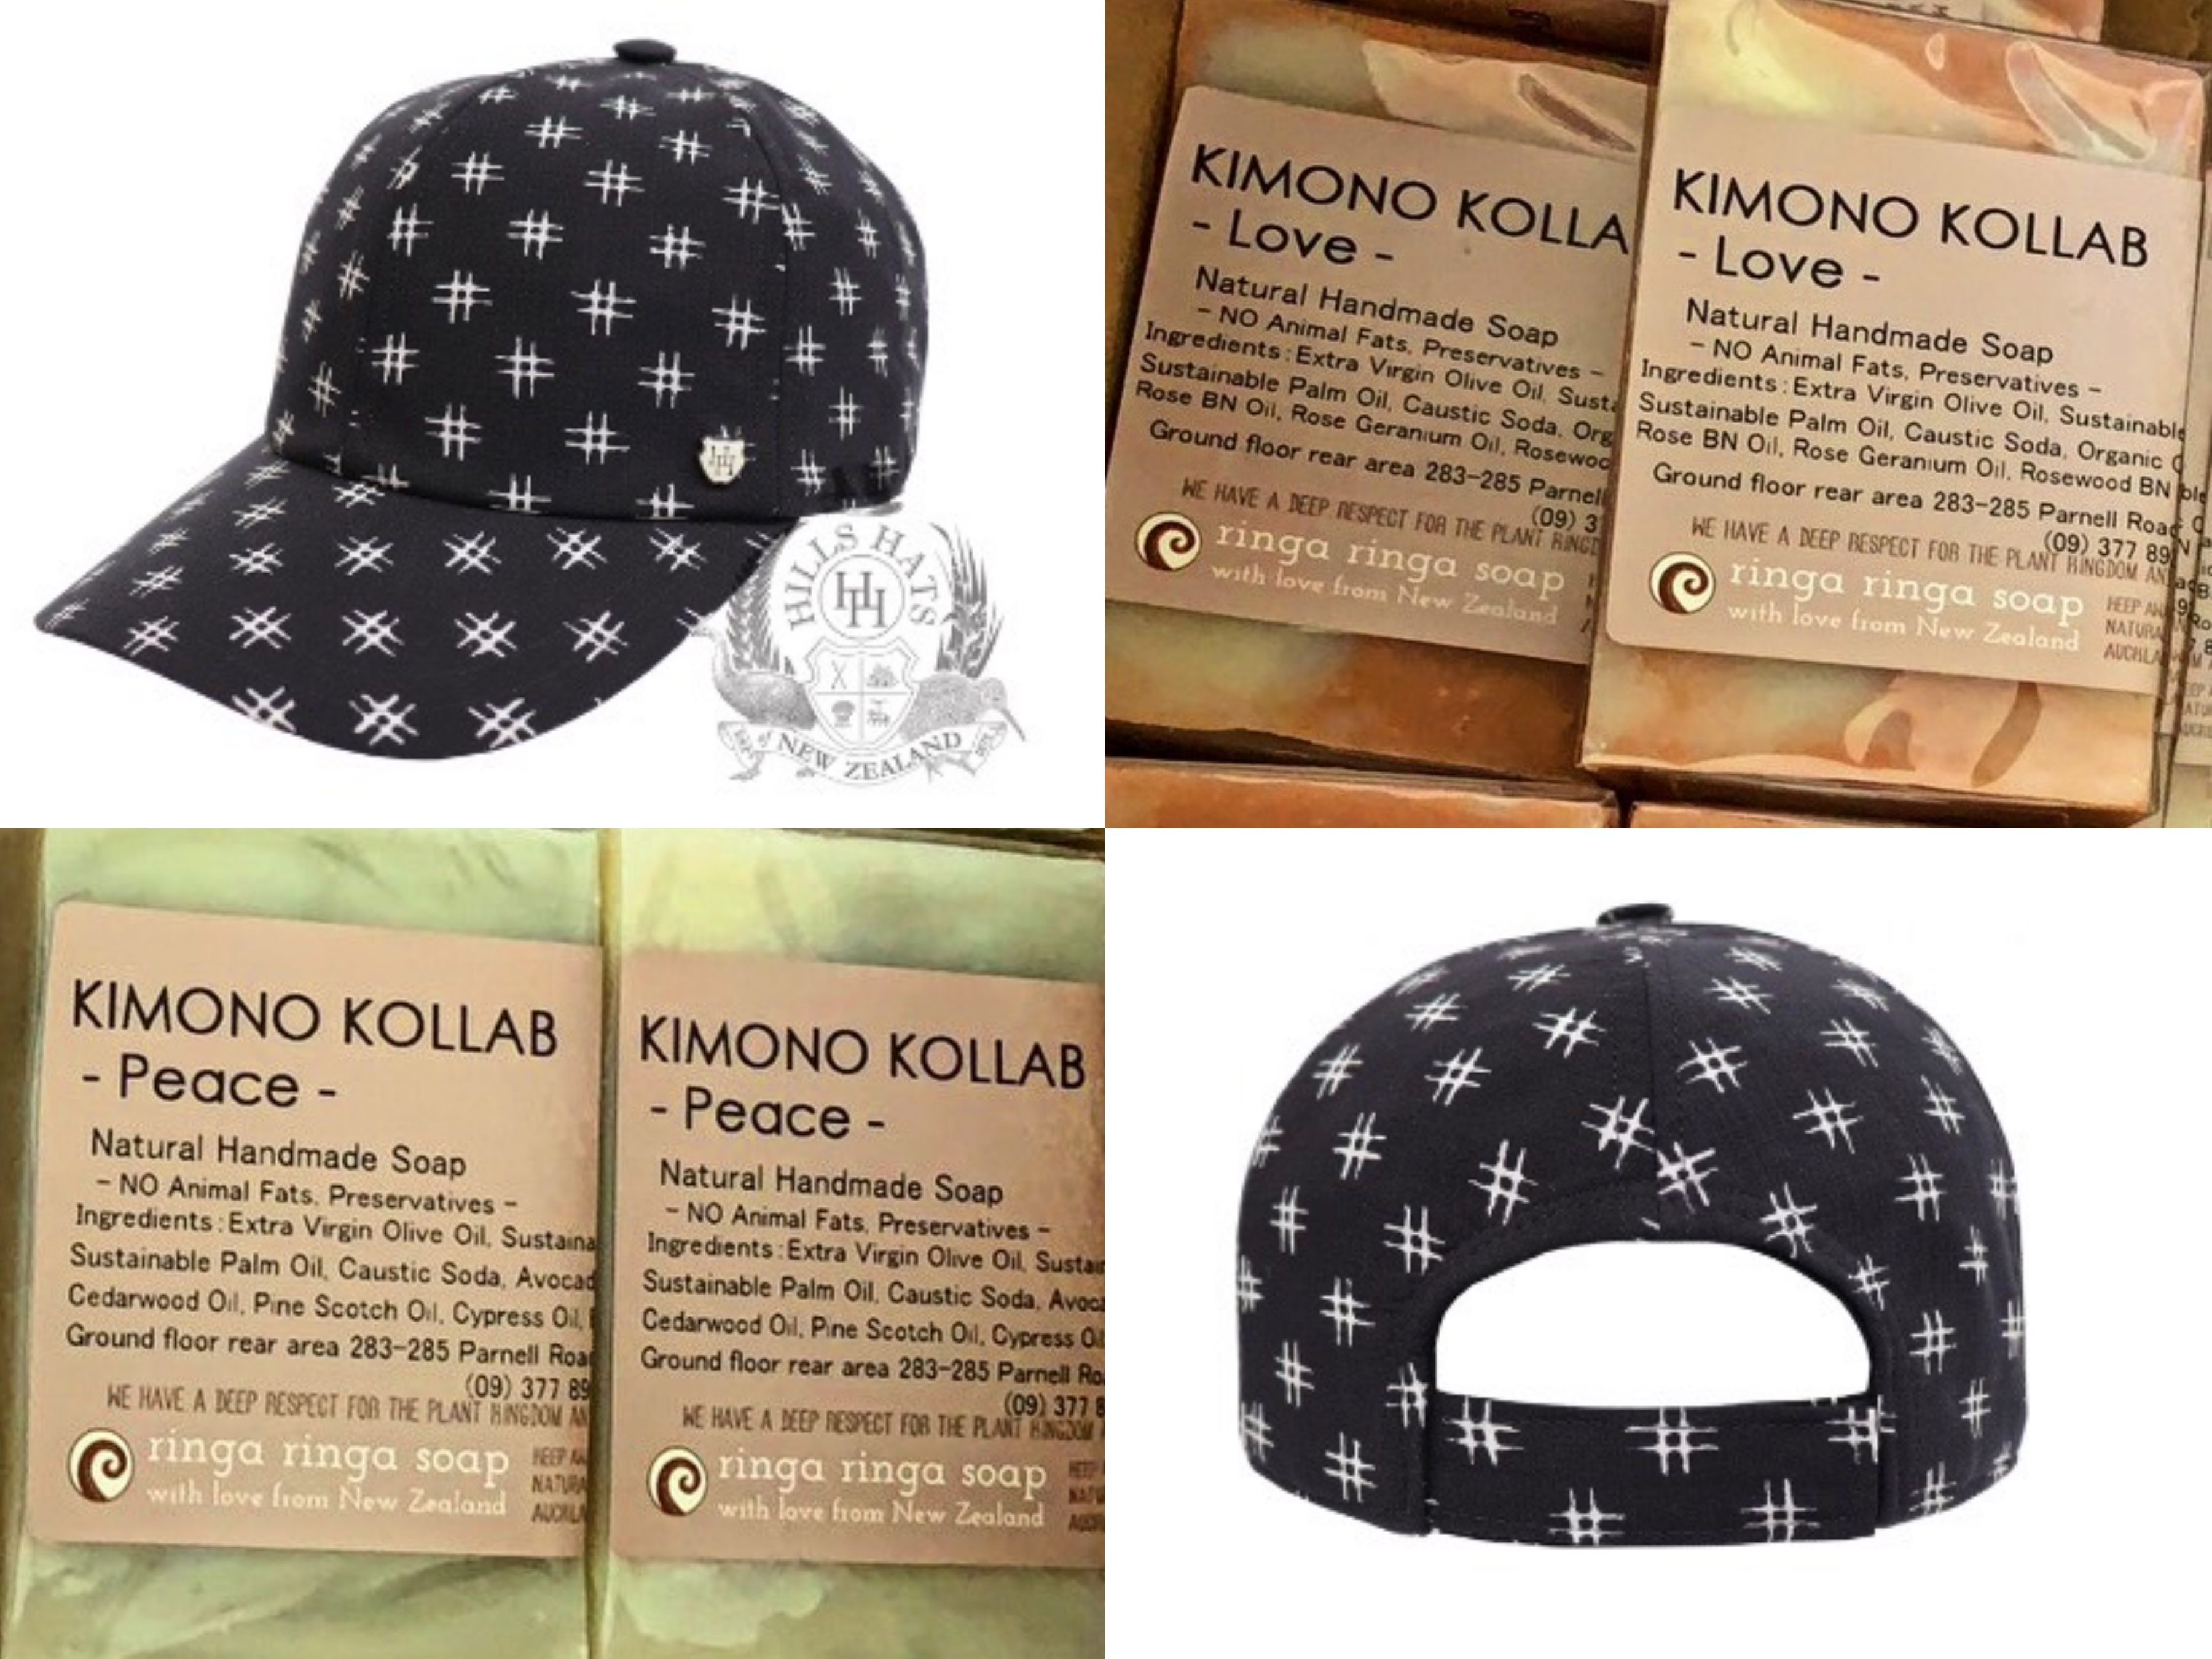 "Special ""KIMONO"" Fabric Cap By ""Hills Hats X KIMONO KOLLAB"" With Organic Soap From NZ Produce By KIMONO KOLLAB"